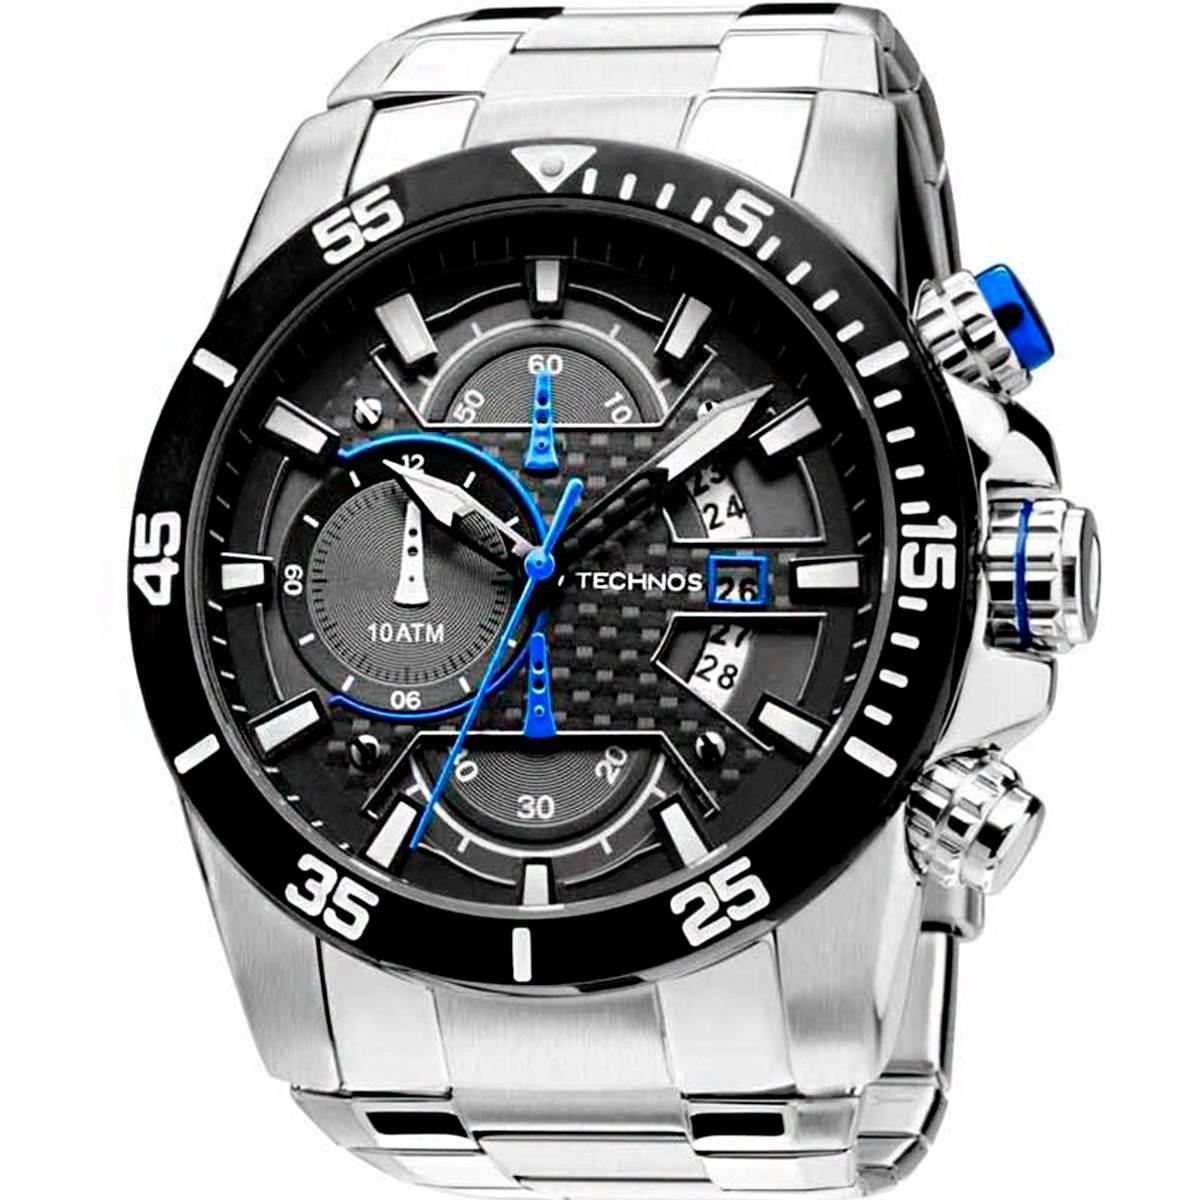 Relógio Technos Prata TS Carbon Masculino Analógico OS10ER/1A